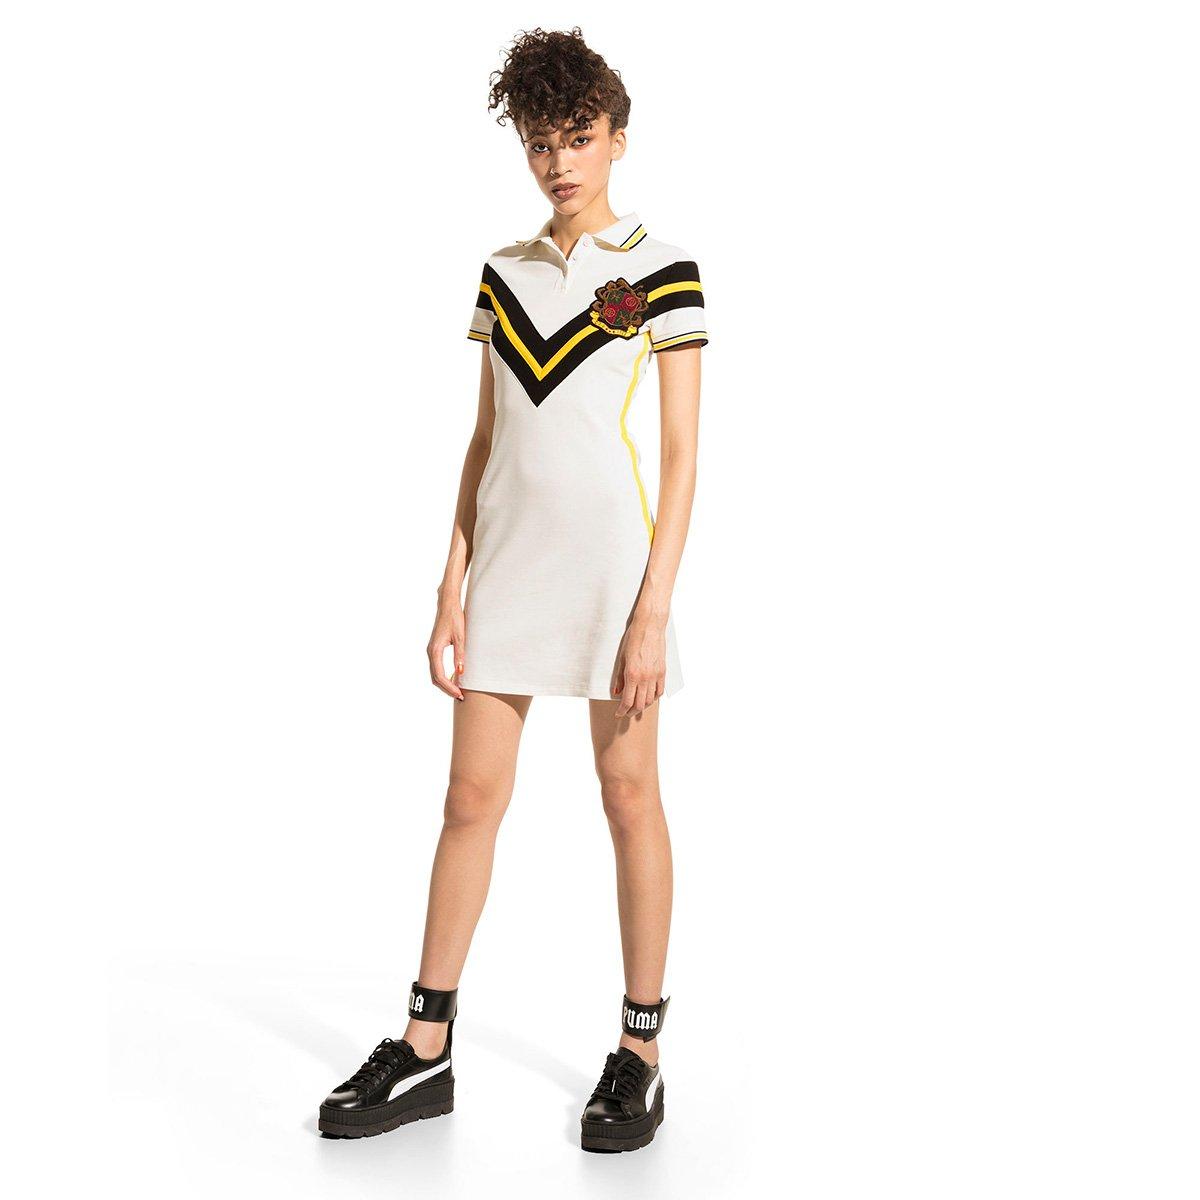 Vestido Puma Varsity Tennis Dress - Tam: G - 2